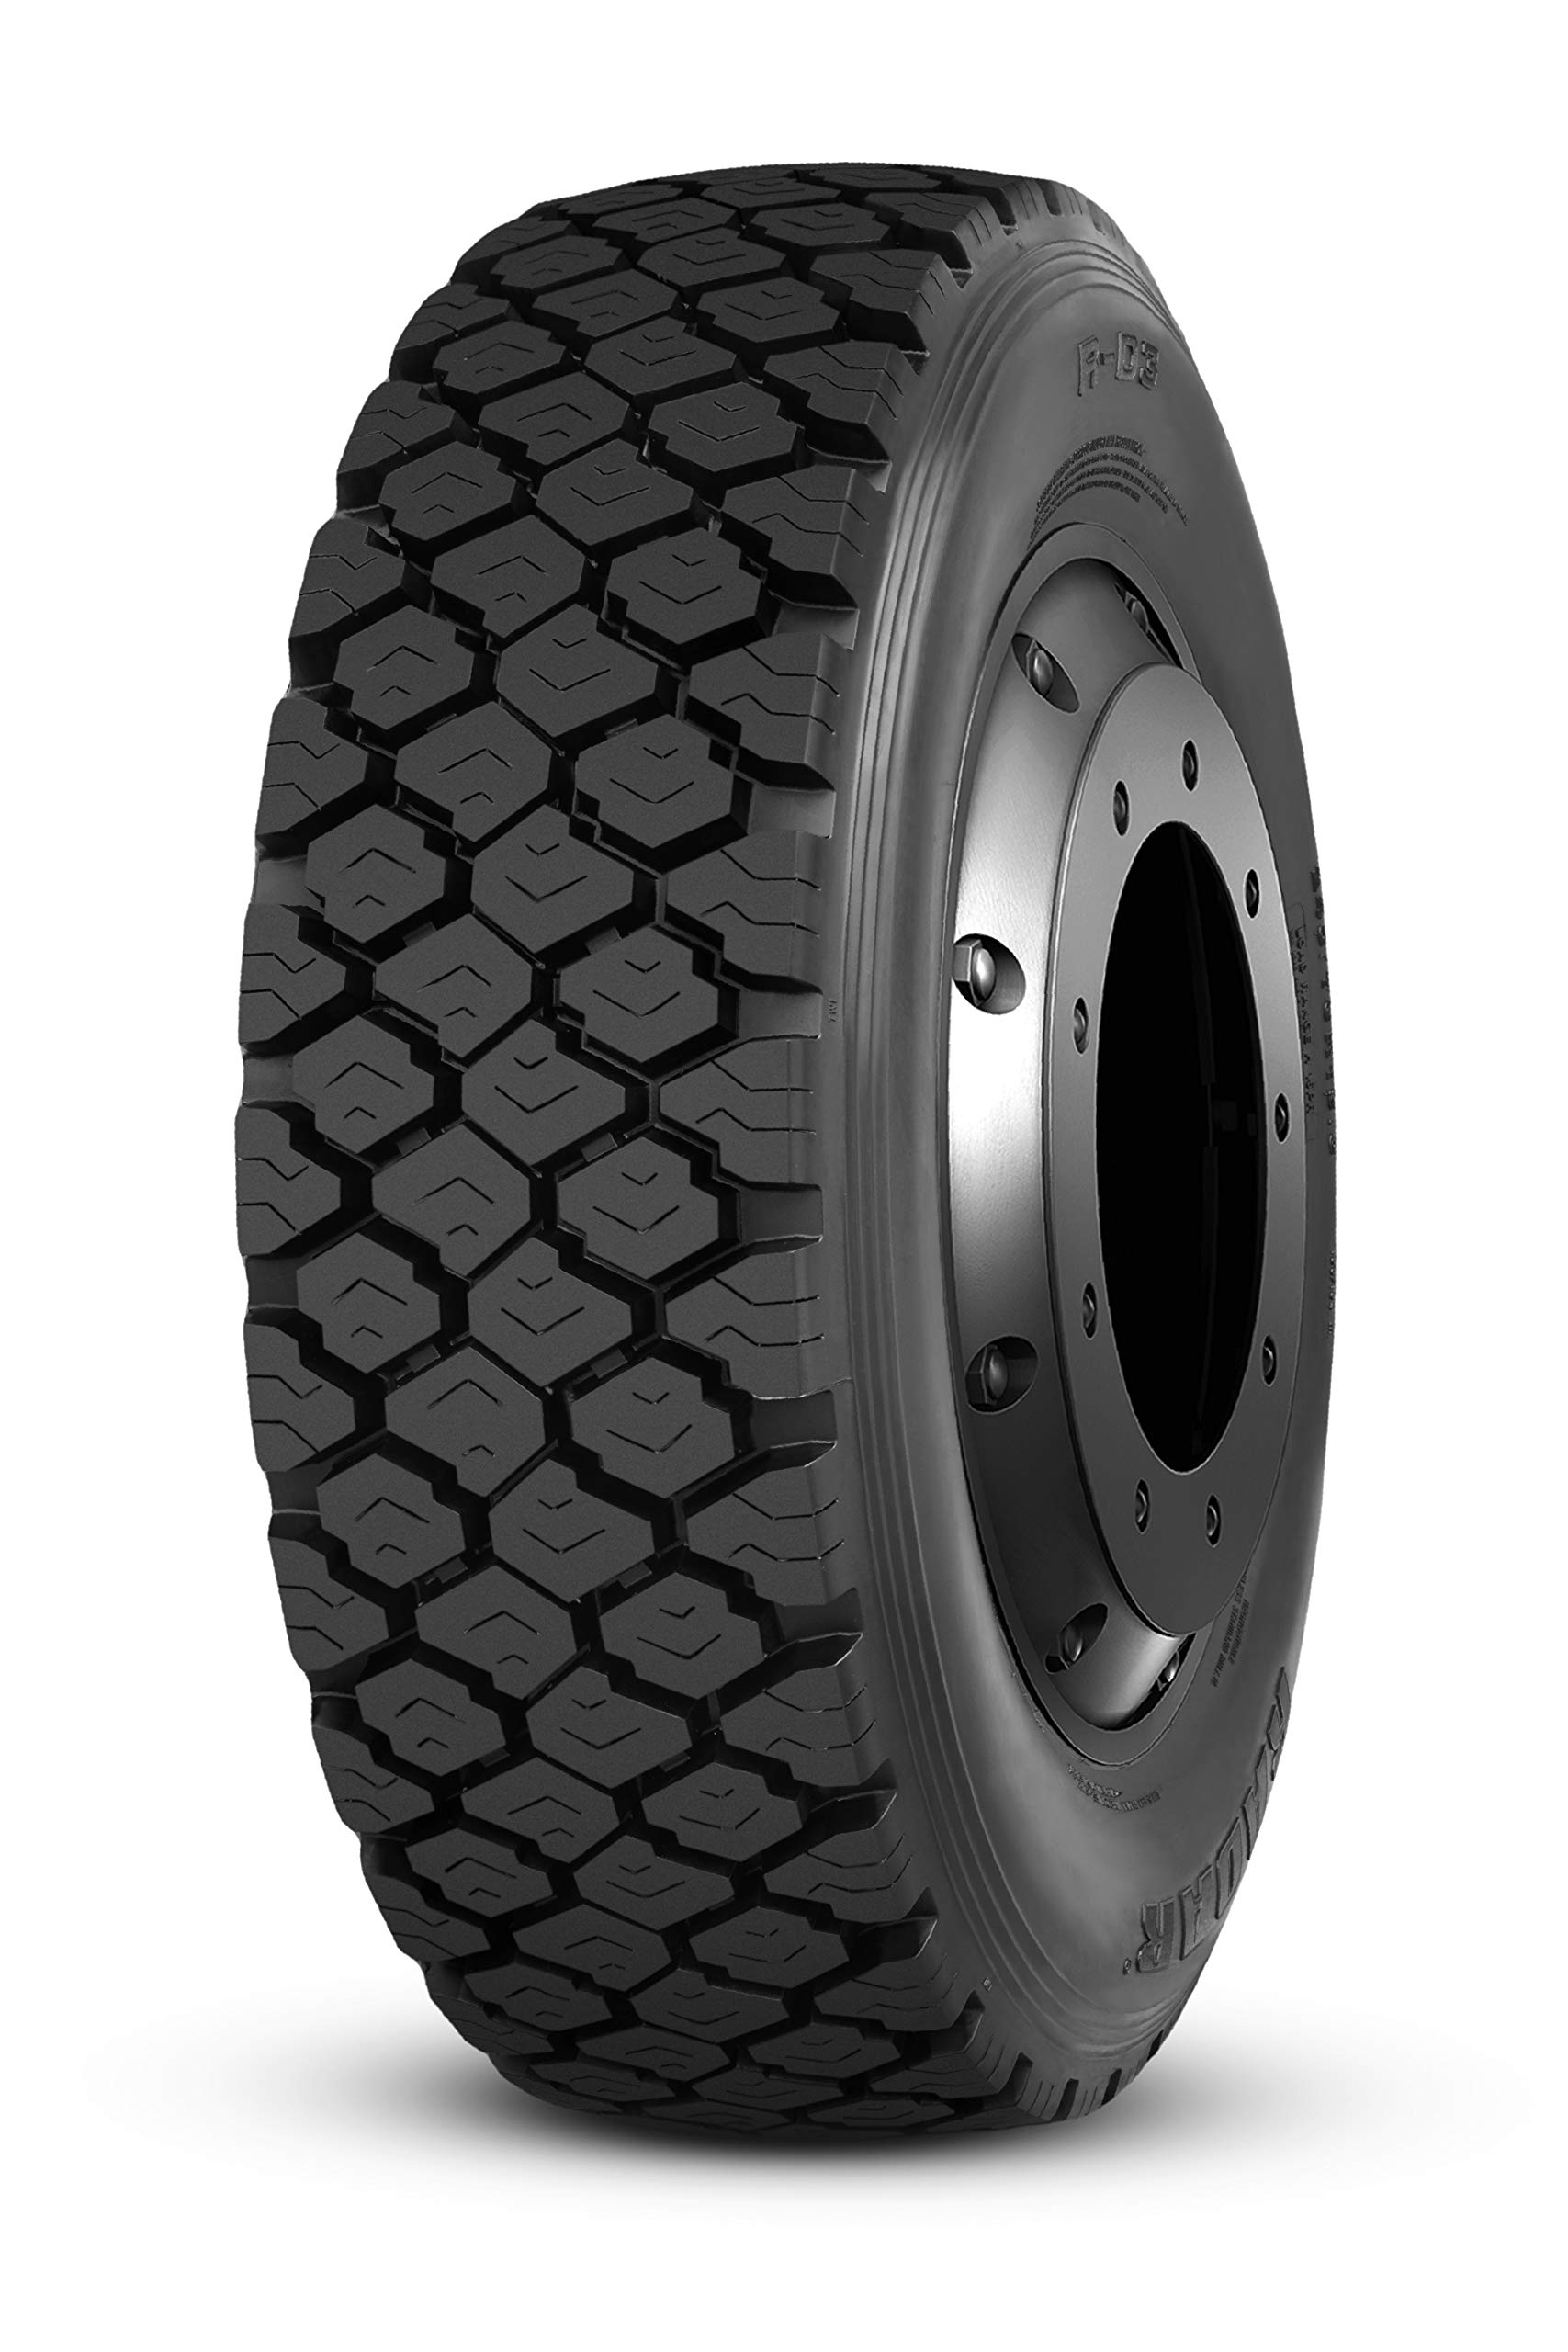 Radar RD3 Commercial Truck Radial Tire-245/70R19.5 136M 16-ply by Radar